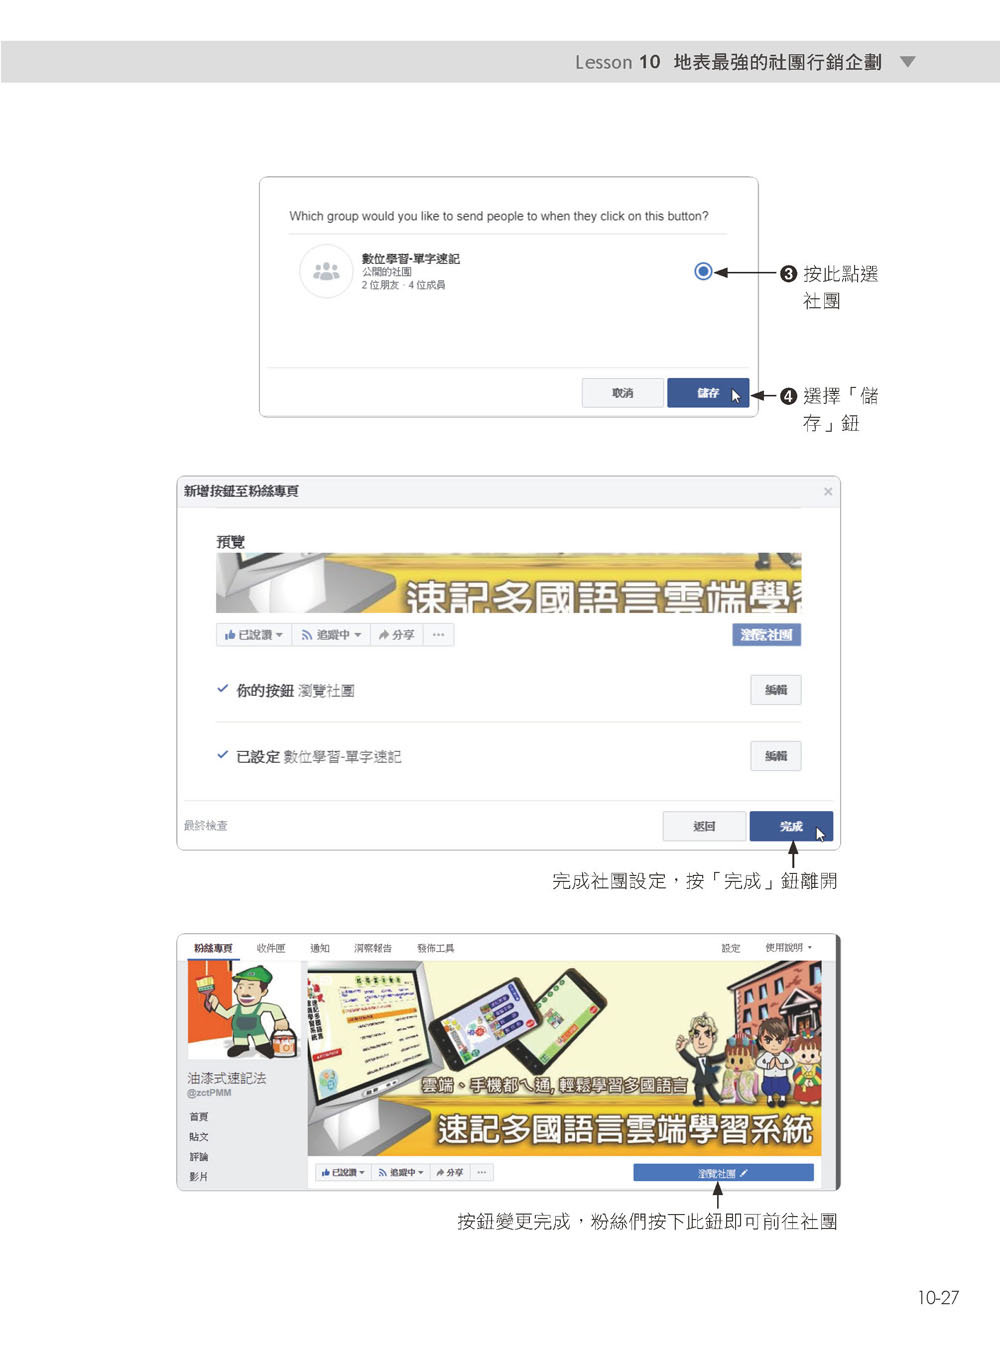 Facebook 互動行銷:社群口碑經營新思路+廣告投放如何有成效,想做好臉書行銷,操作心法就在這!-preview-62